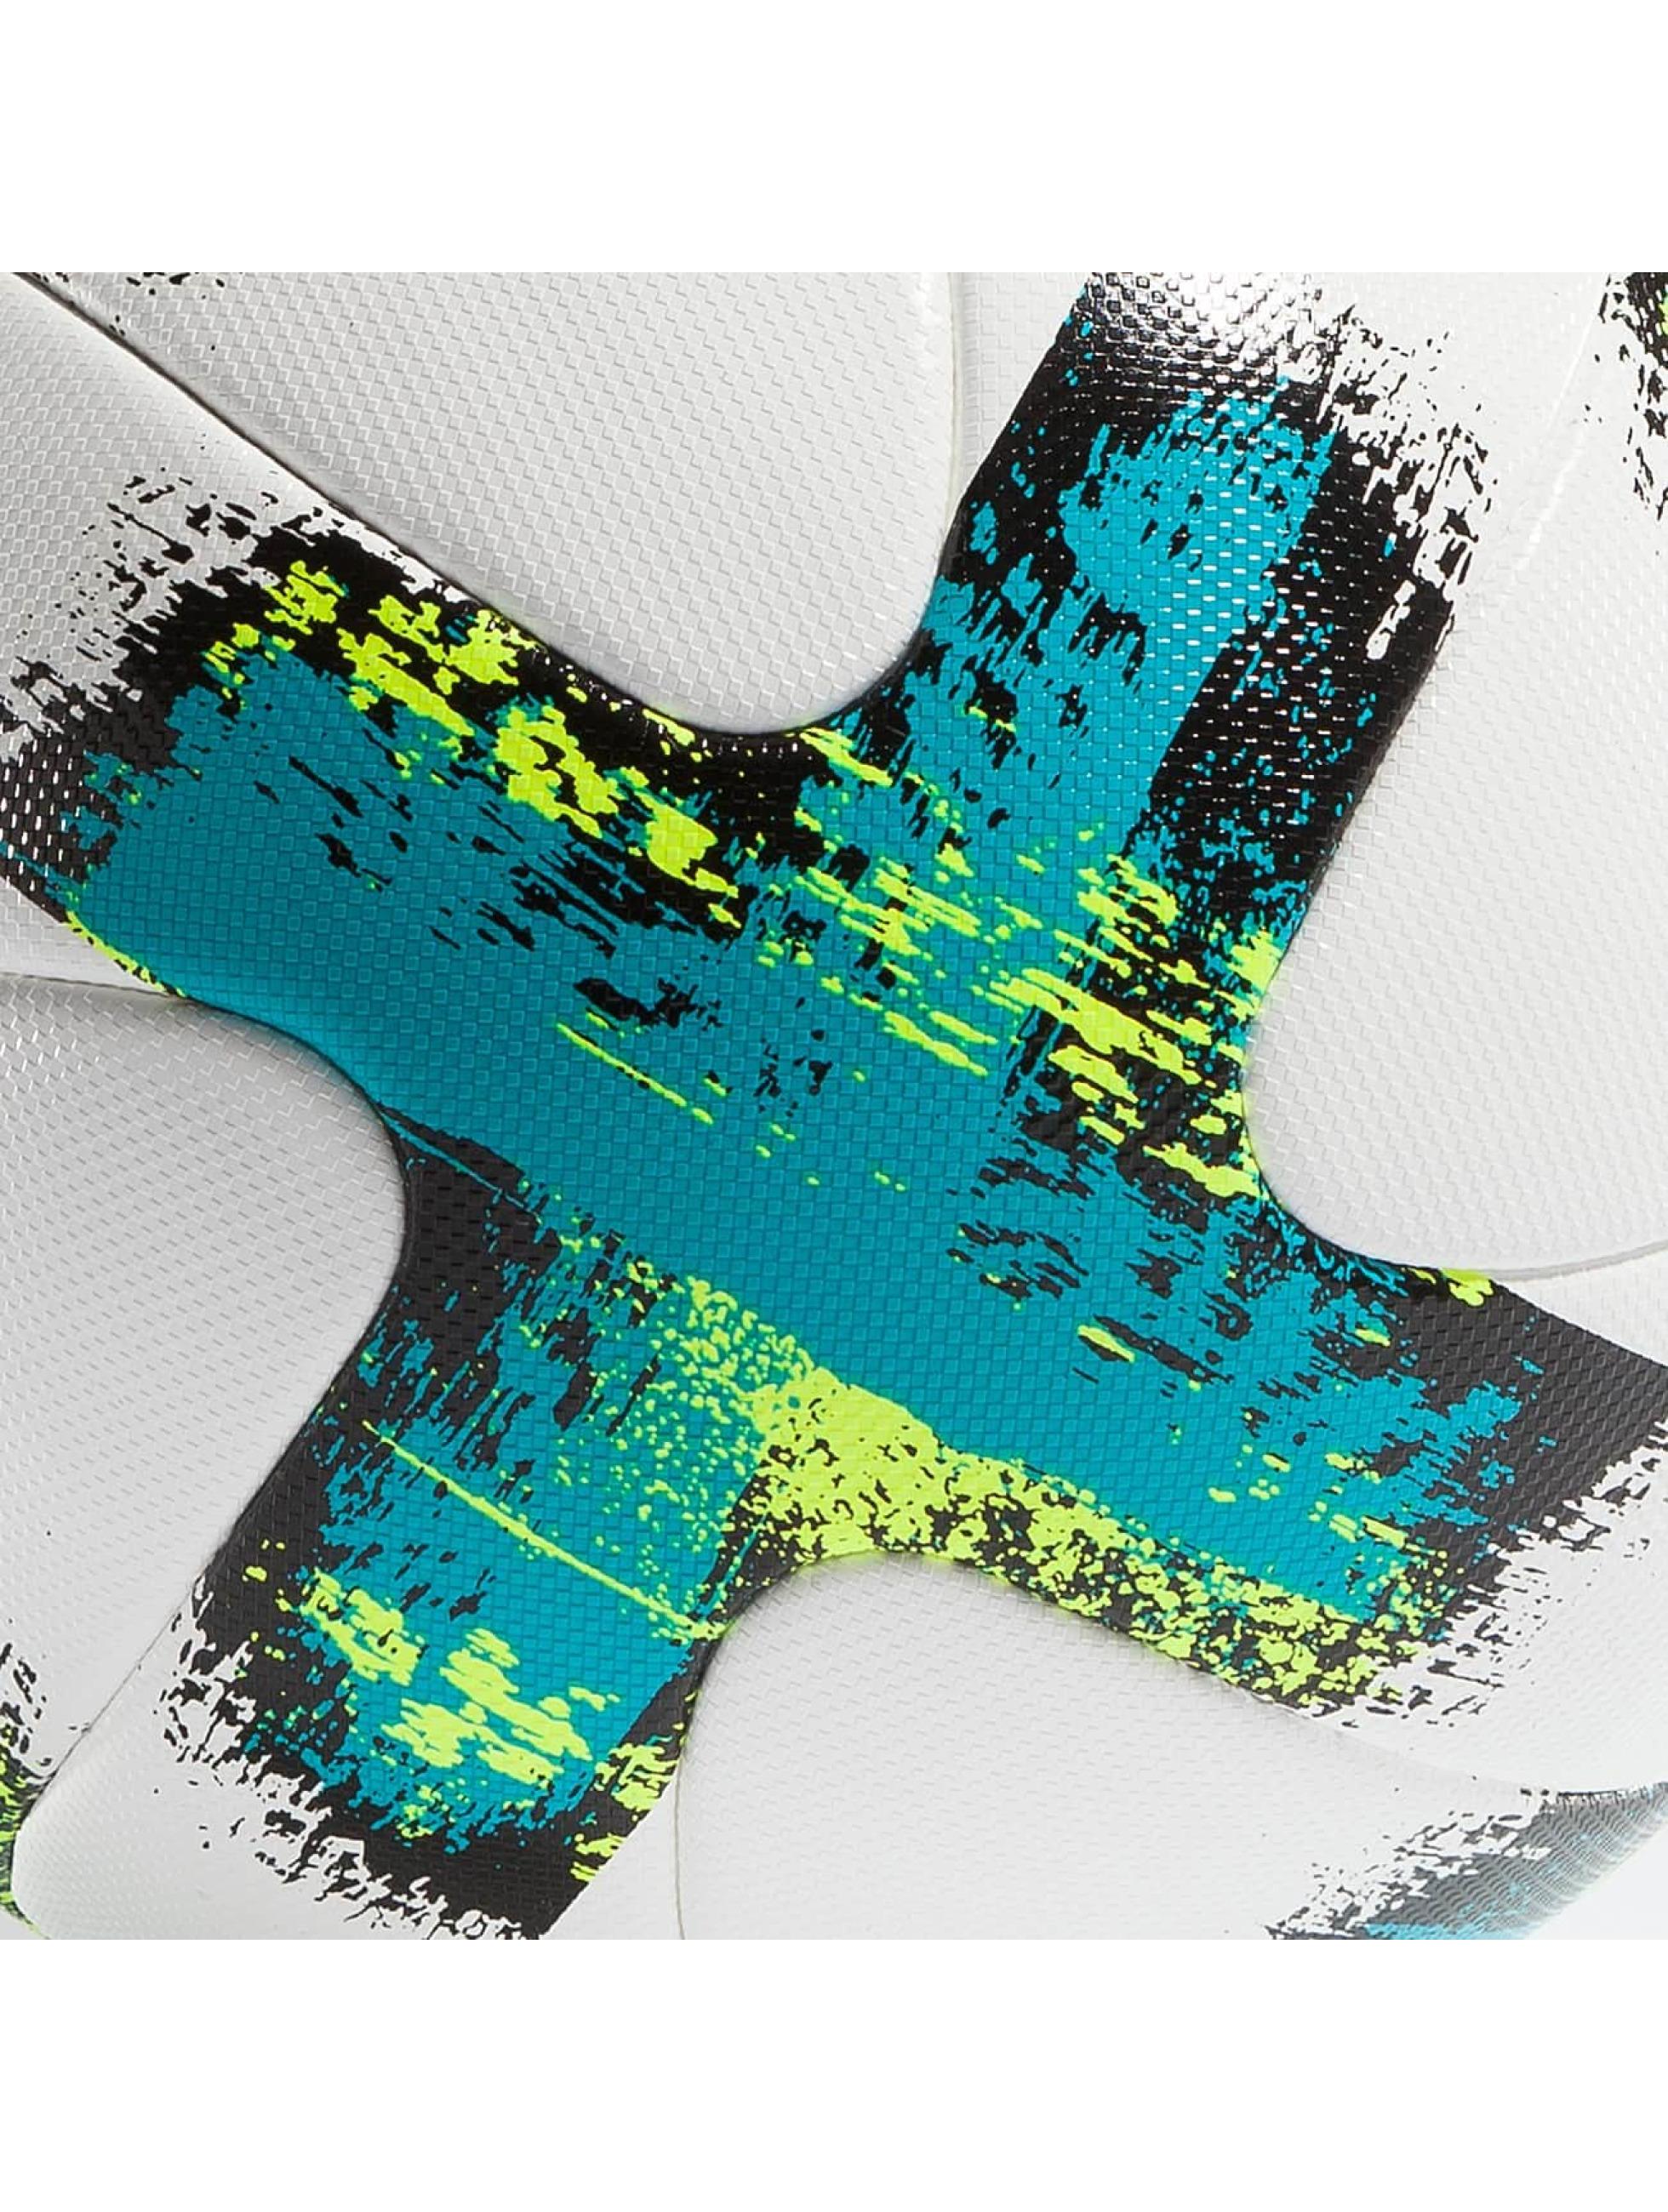 adidas Performance Balls Torfabrik Offical Match Ball bílý